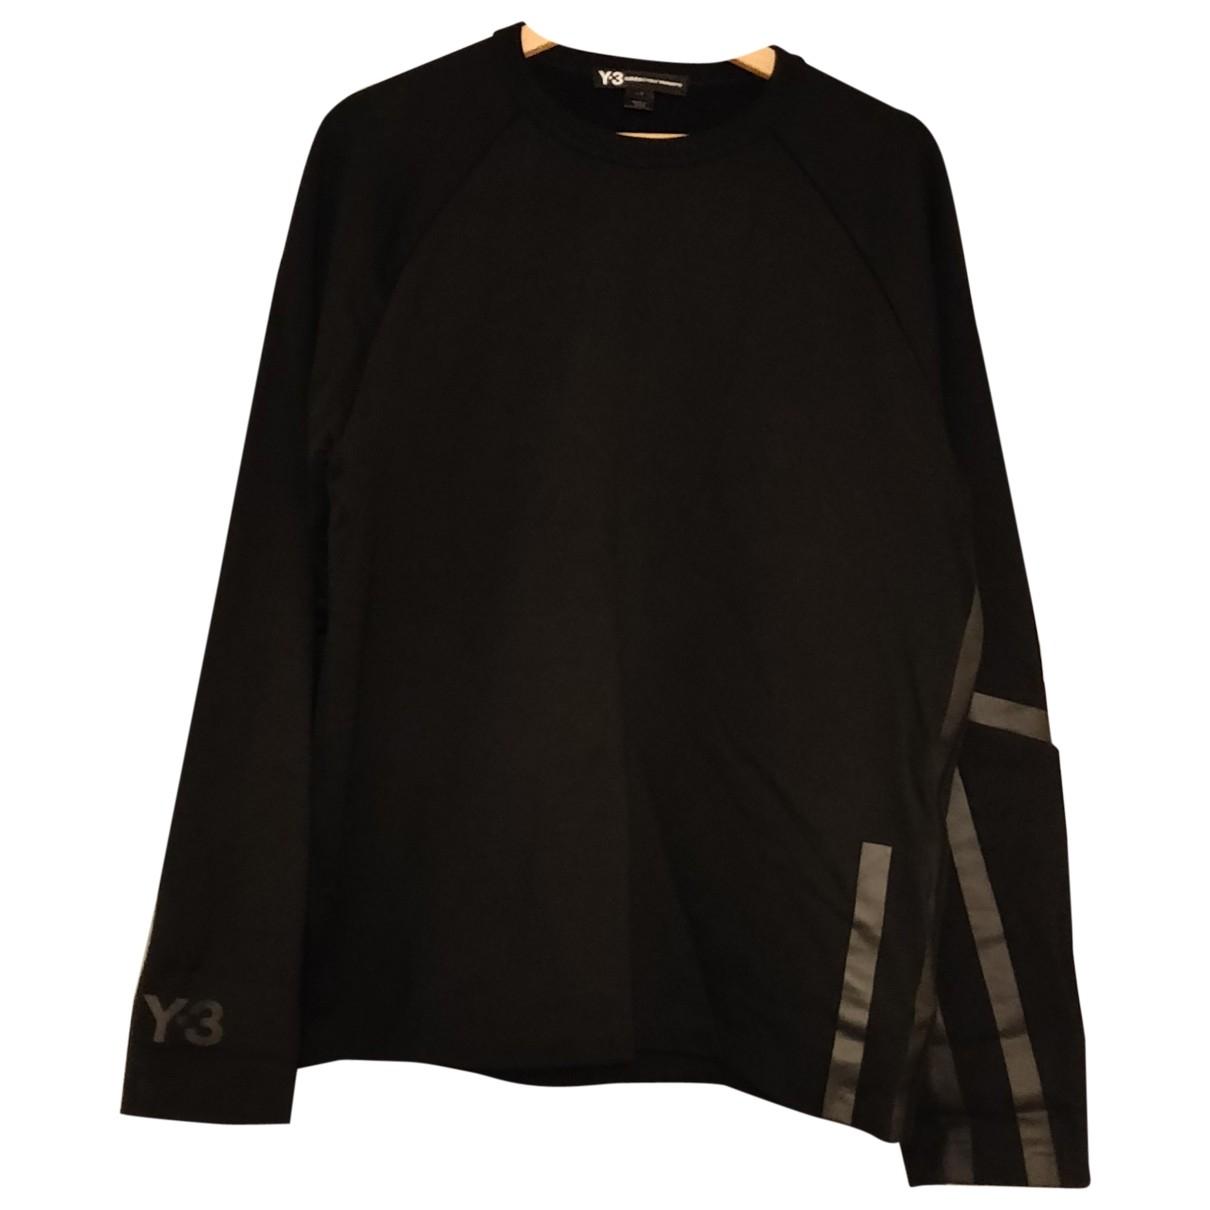 Y-3 By Yohji Yamamoto \N Black Cotton Knitwear & Sweatshirts for Men L International